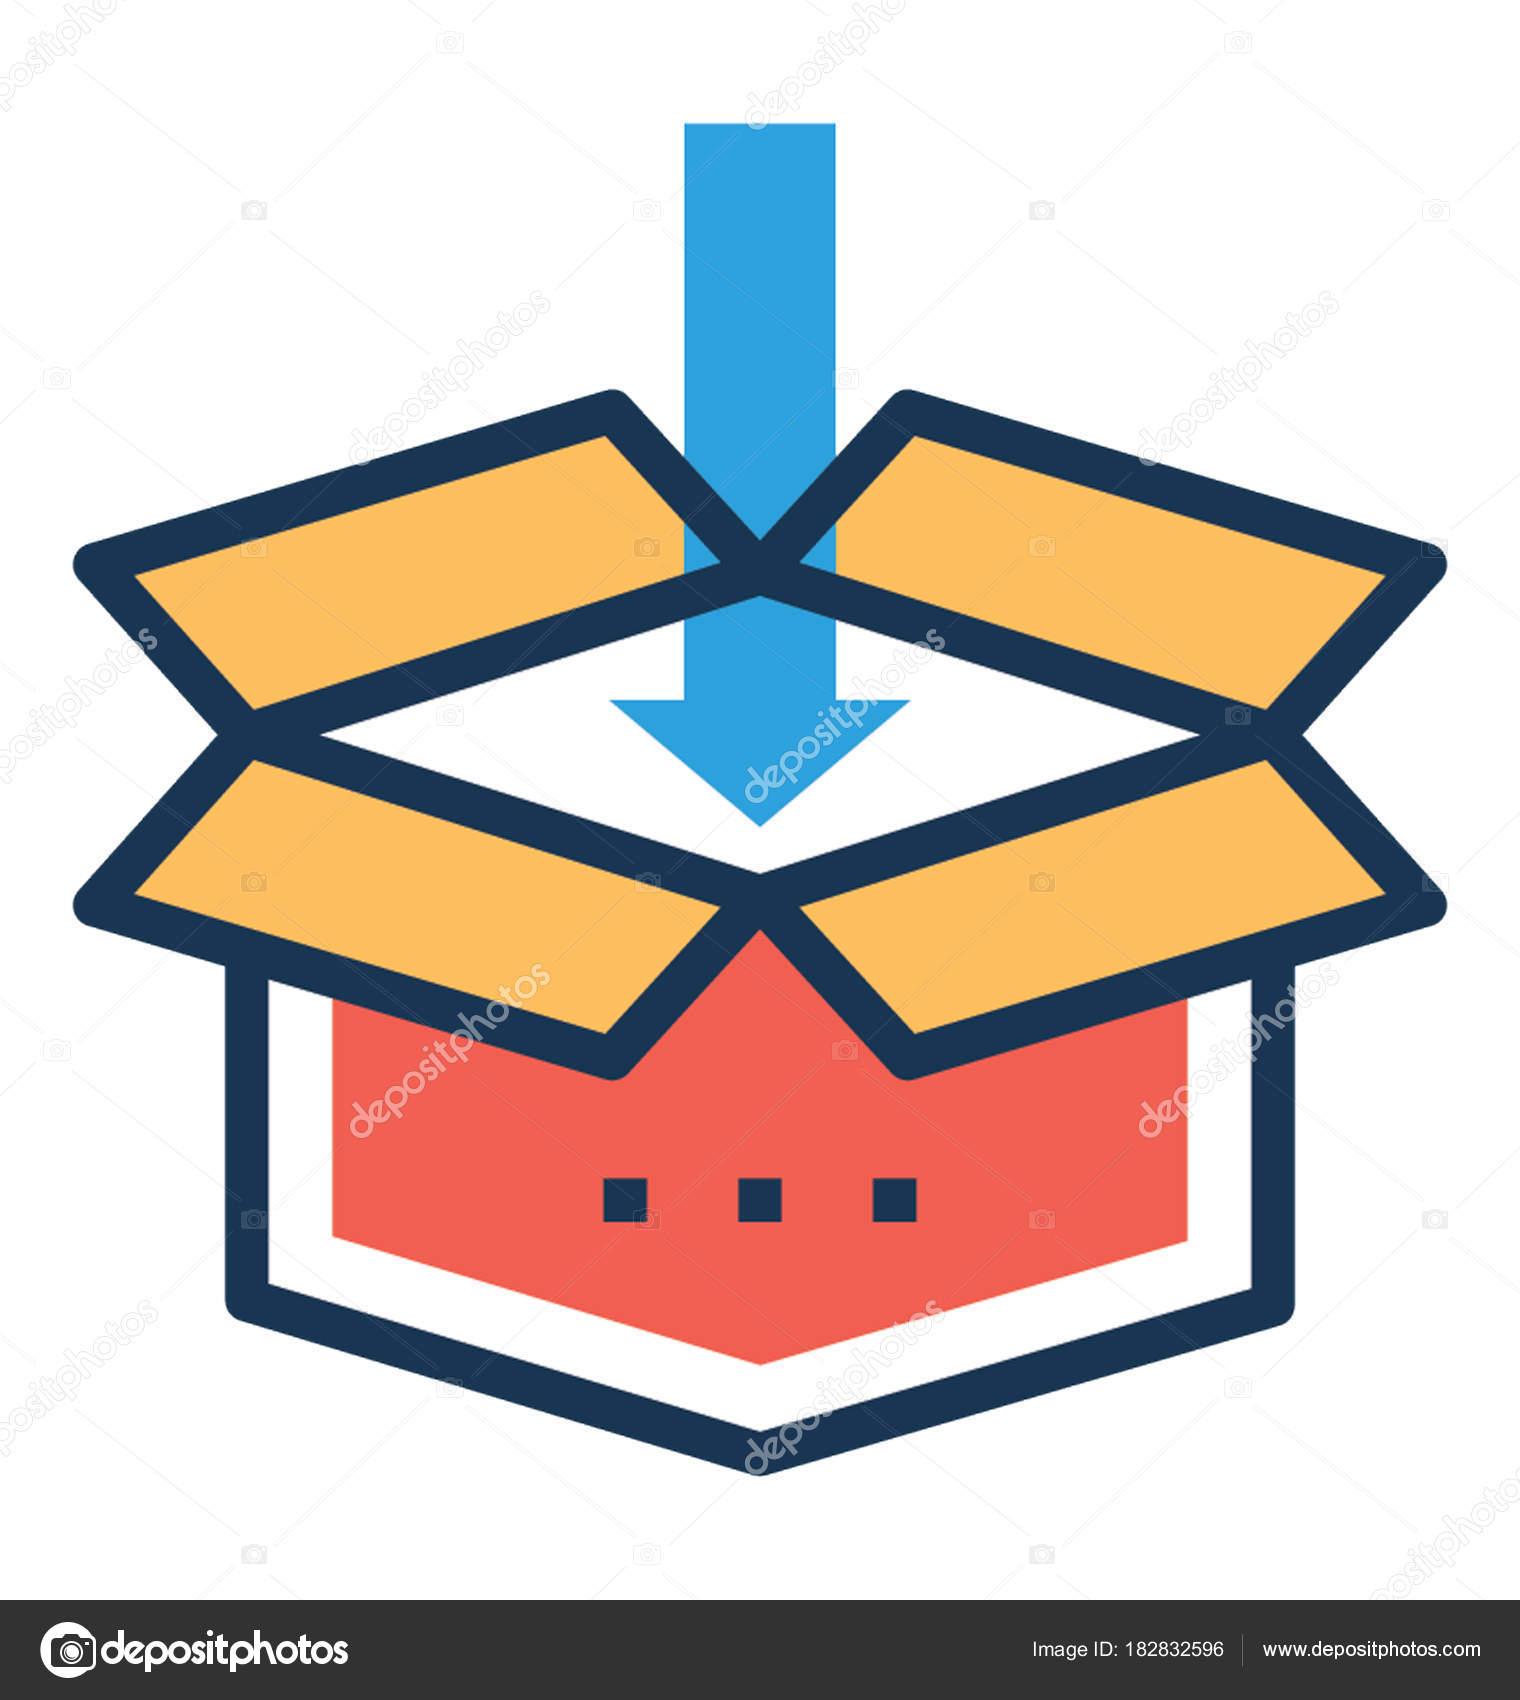 Dropbox Flat Vector Icon Stock Vector Prosymbols 182832596